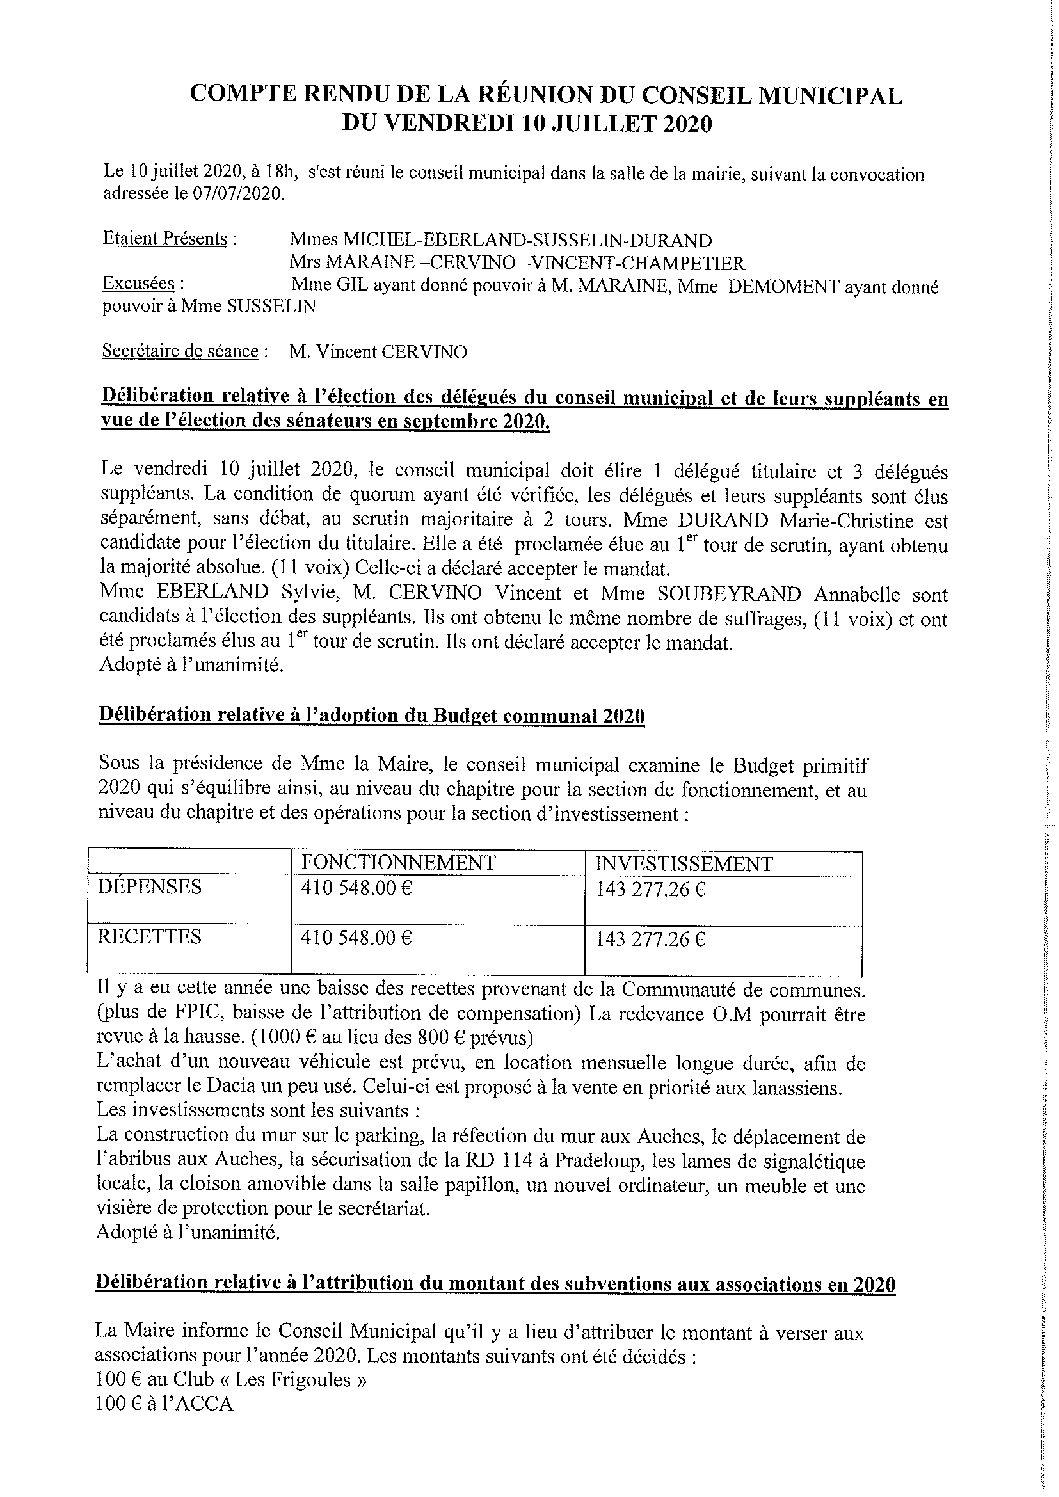 CR du Conseil municipal du 10 juillet 2020